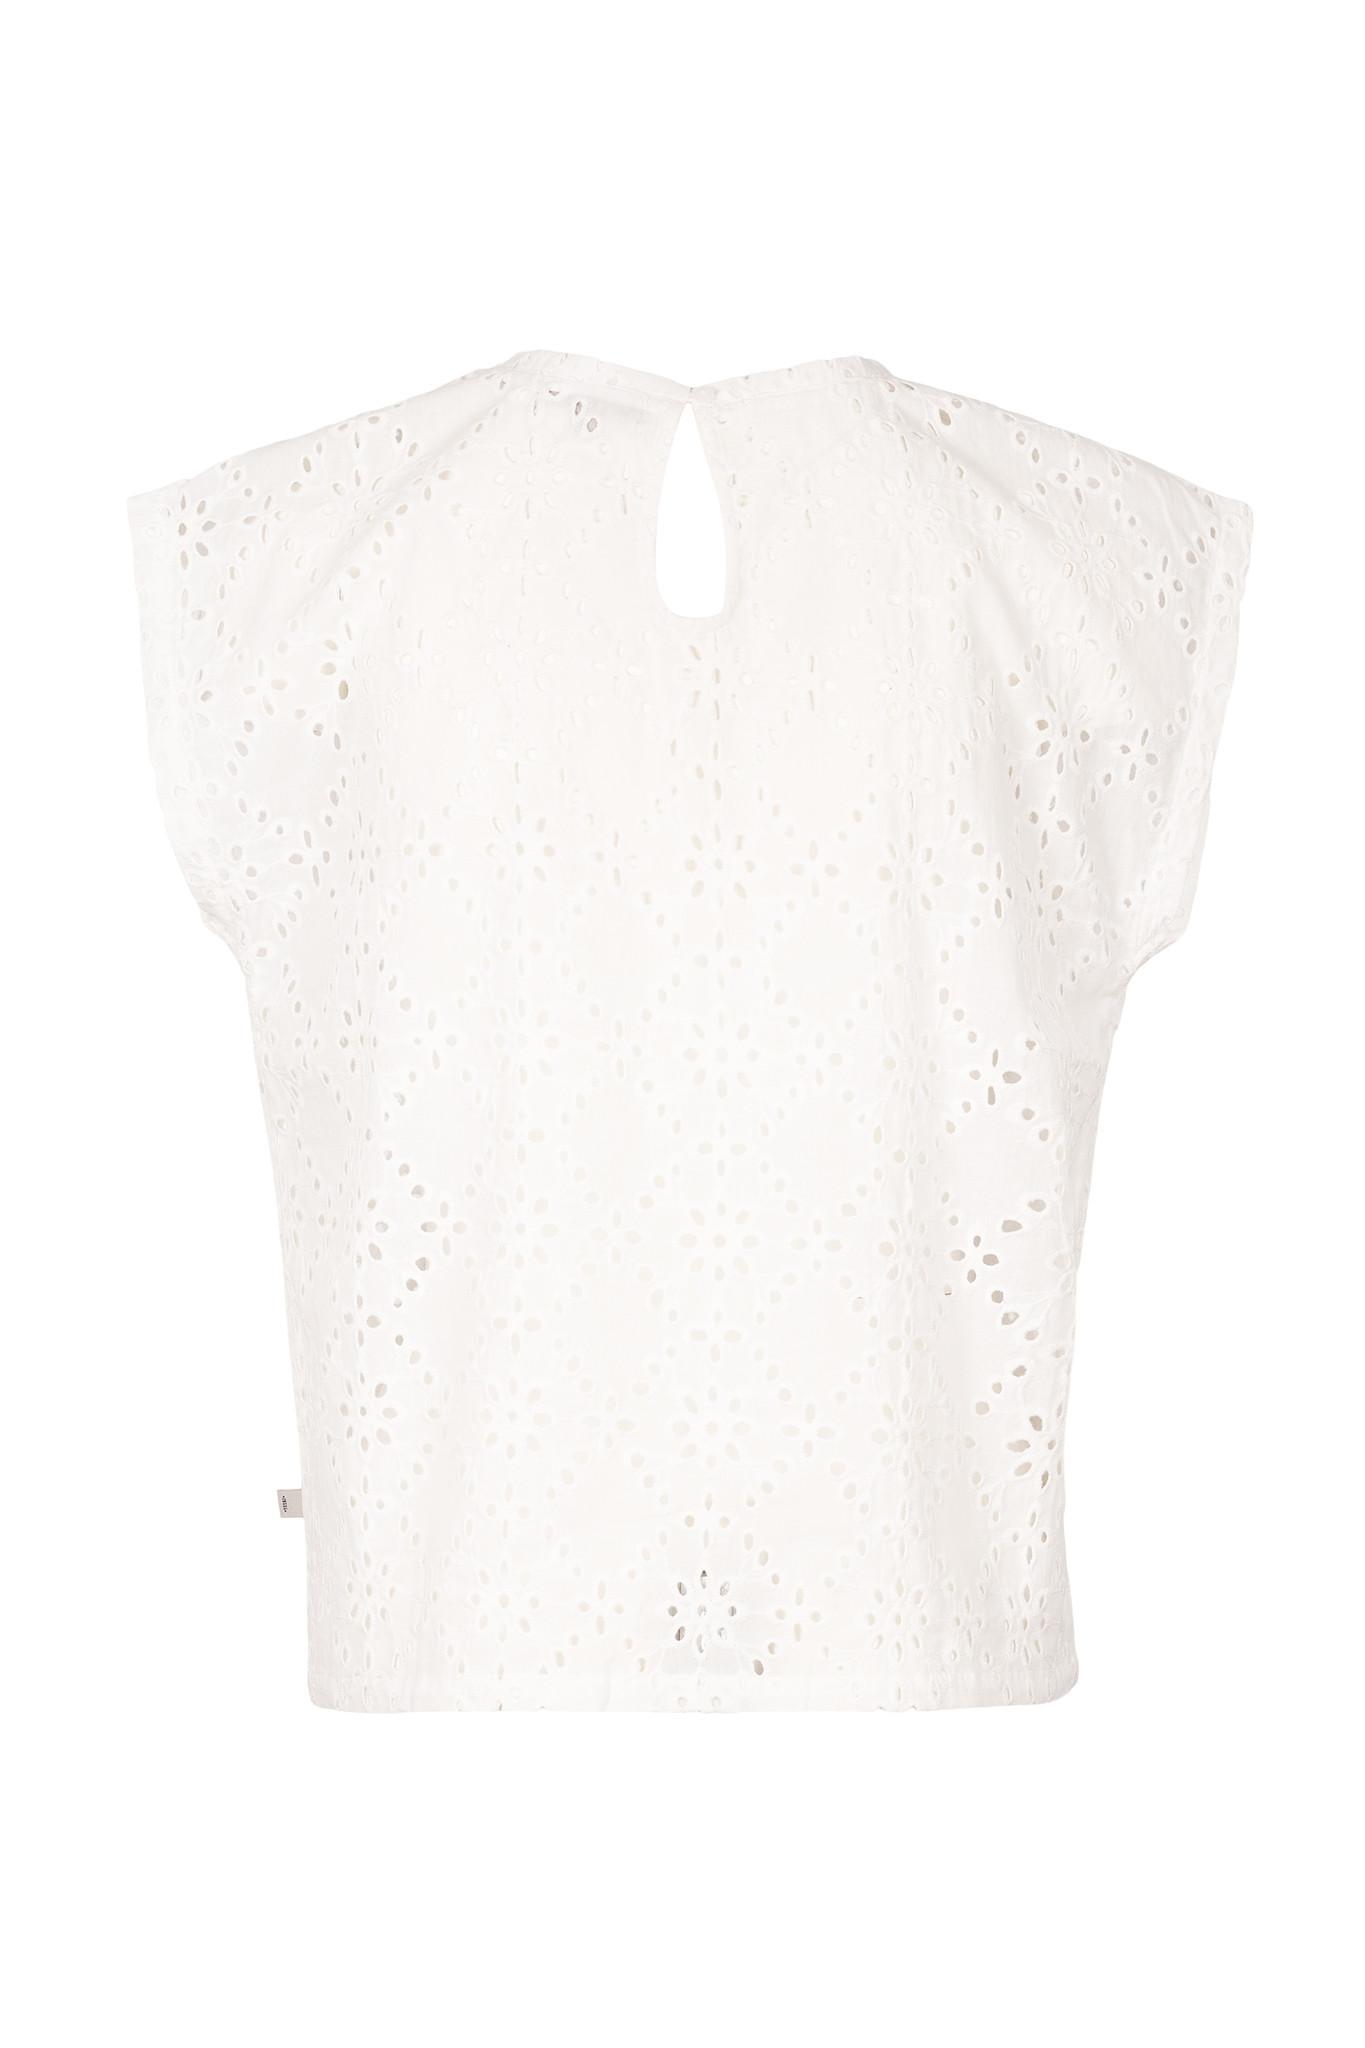 Zusss broderie blouseje - wit